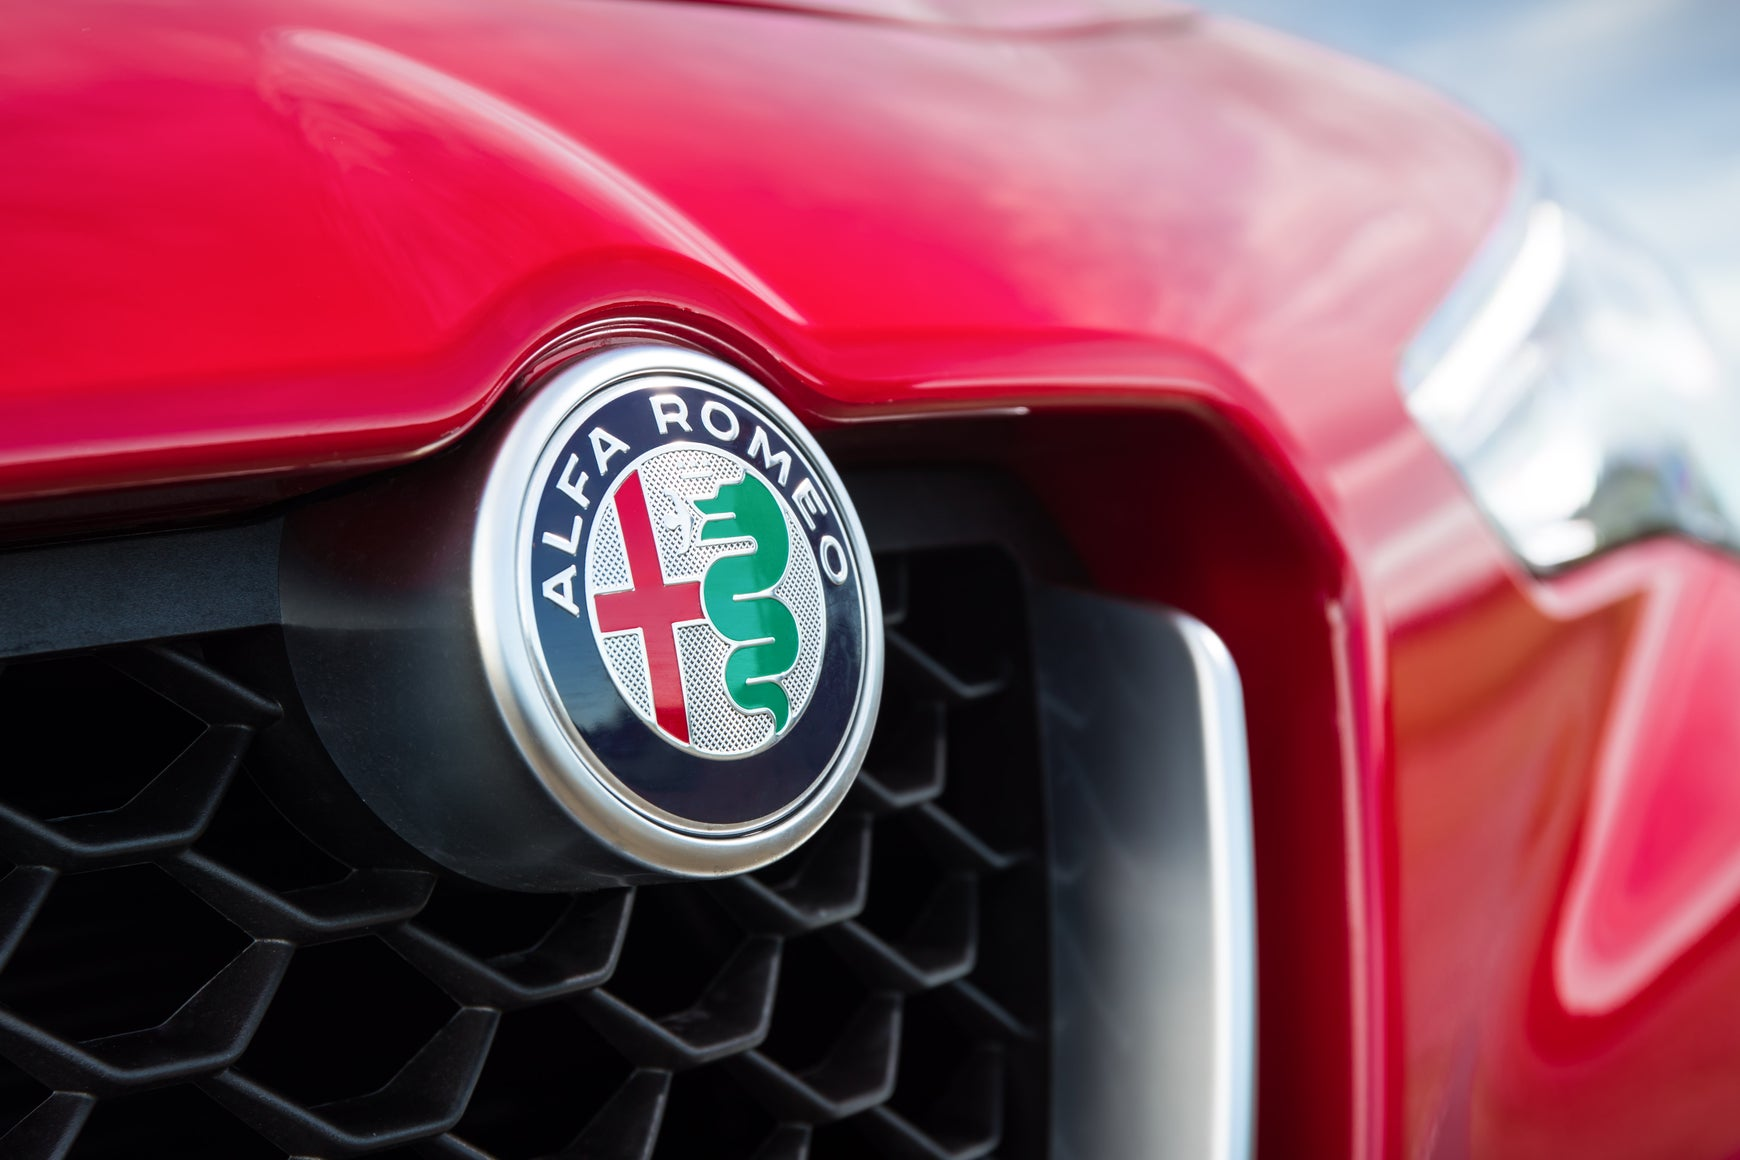 Alfa Romeo badge on grille